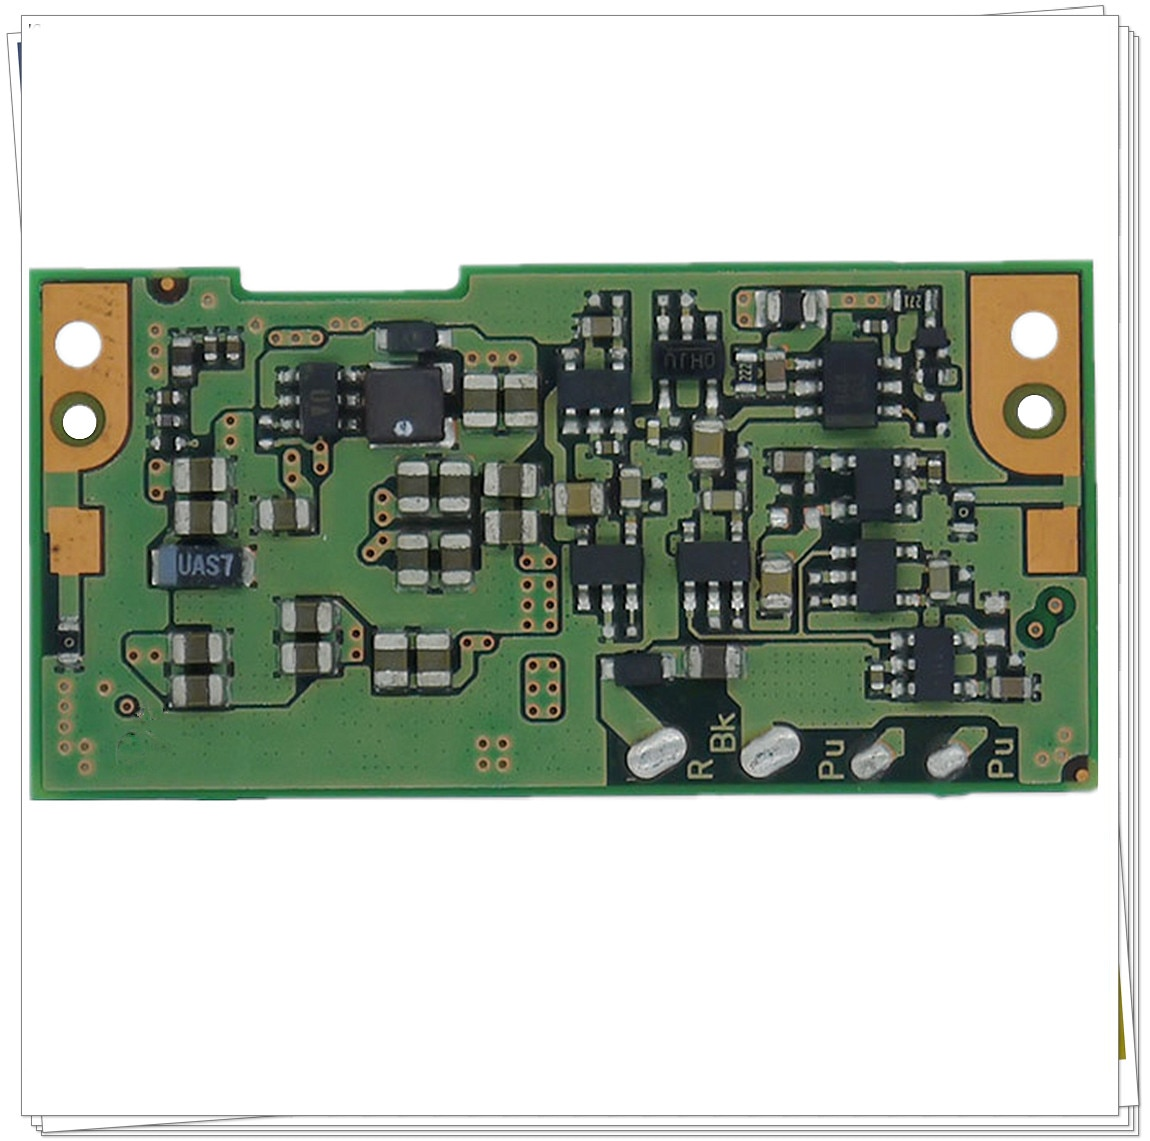 NOVA ORIDINAL CCD/COMS sensor unidade matriz board/PCB peças de reparo para nikon D5100 slr